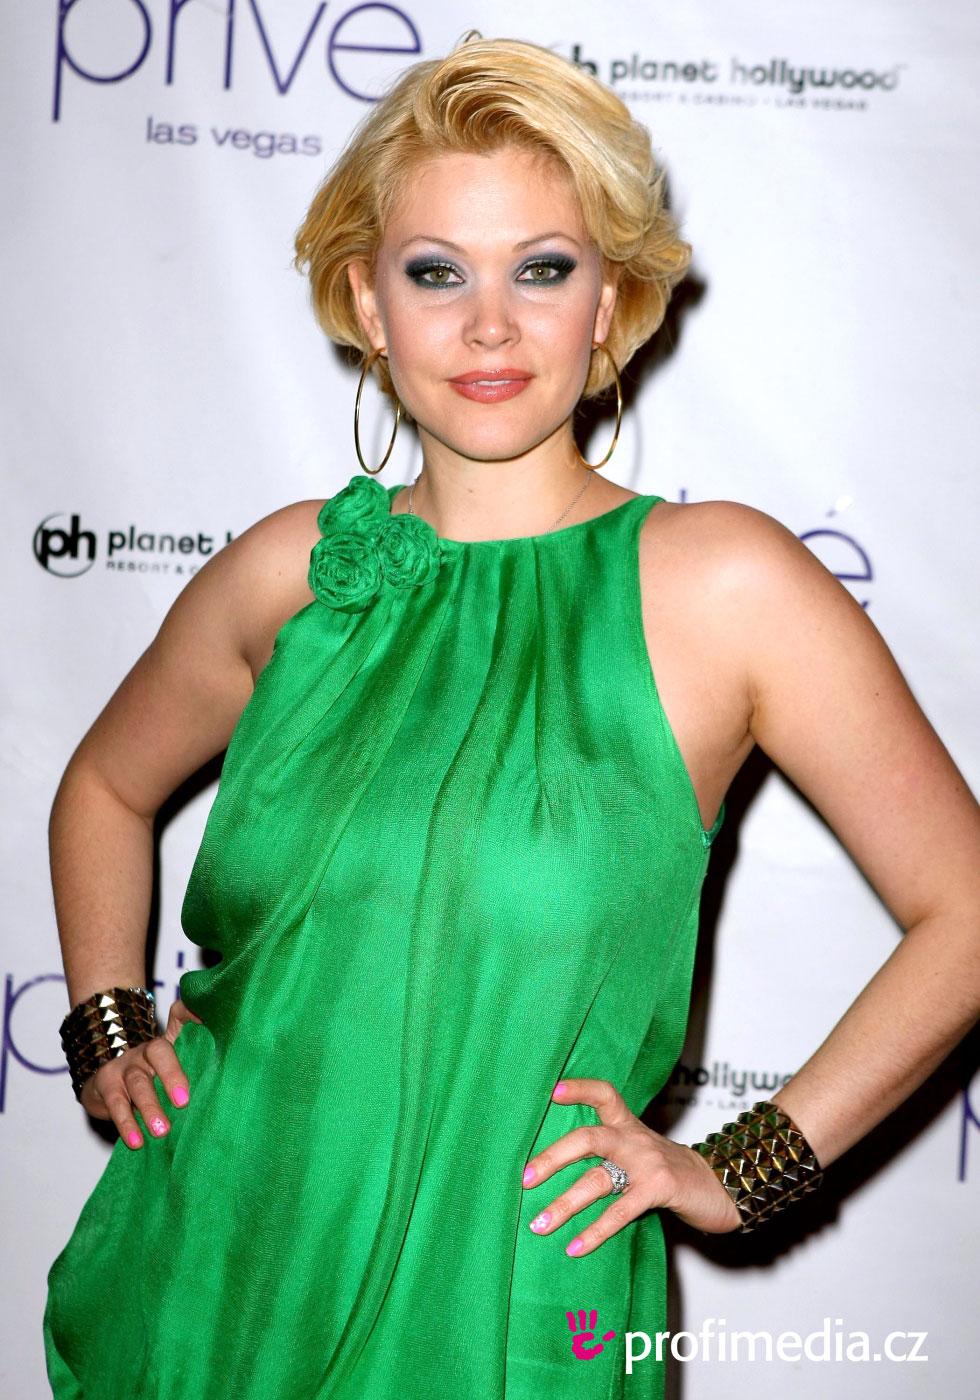 Shanna Moakler Hairstyle Easyhairstyler